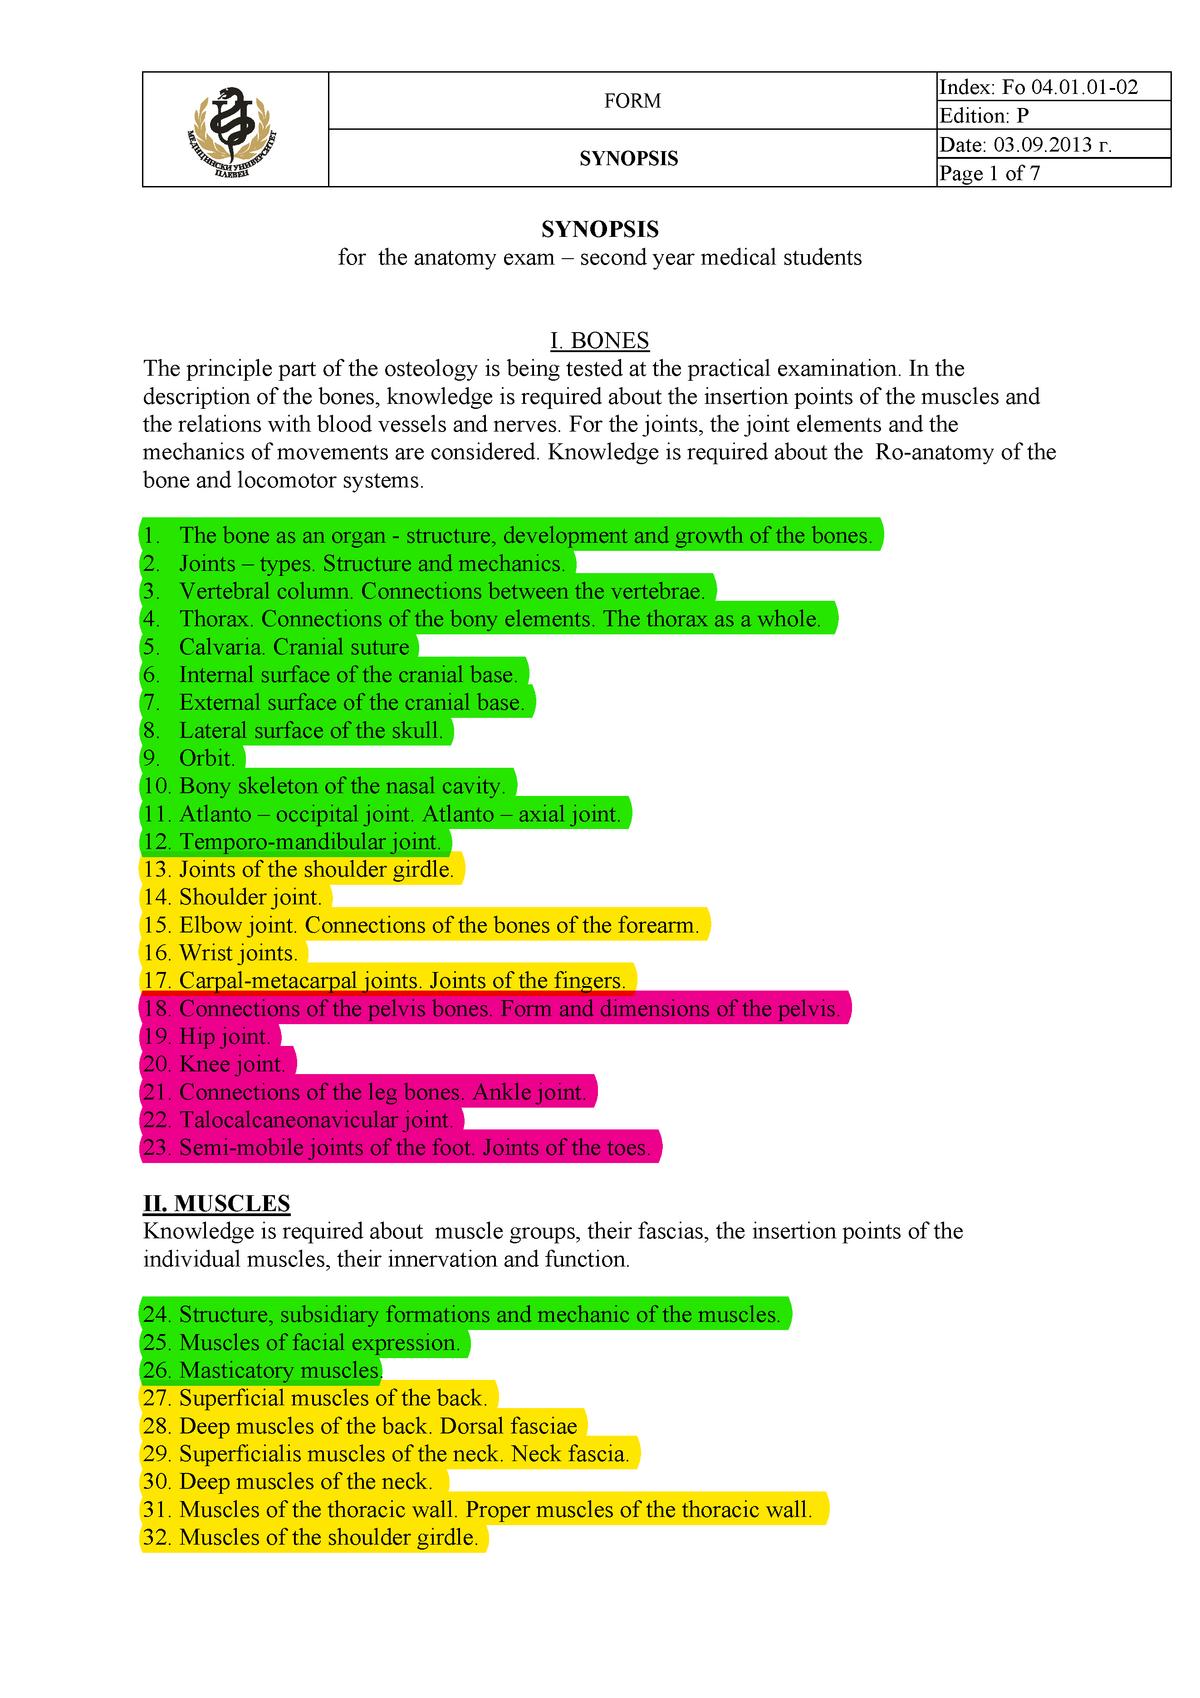 Anatomy synopsis - 1234 - StuDocu